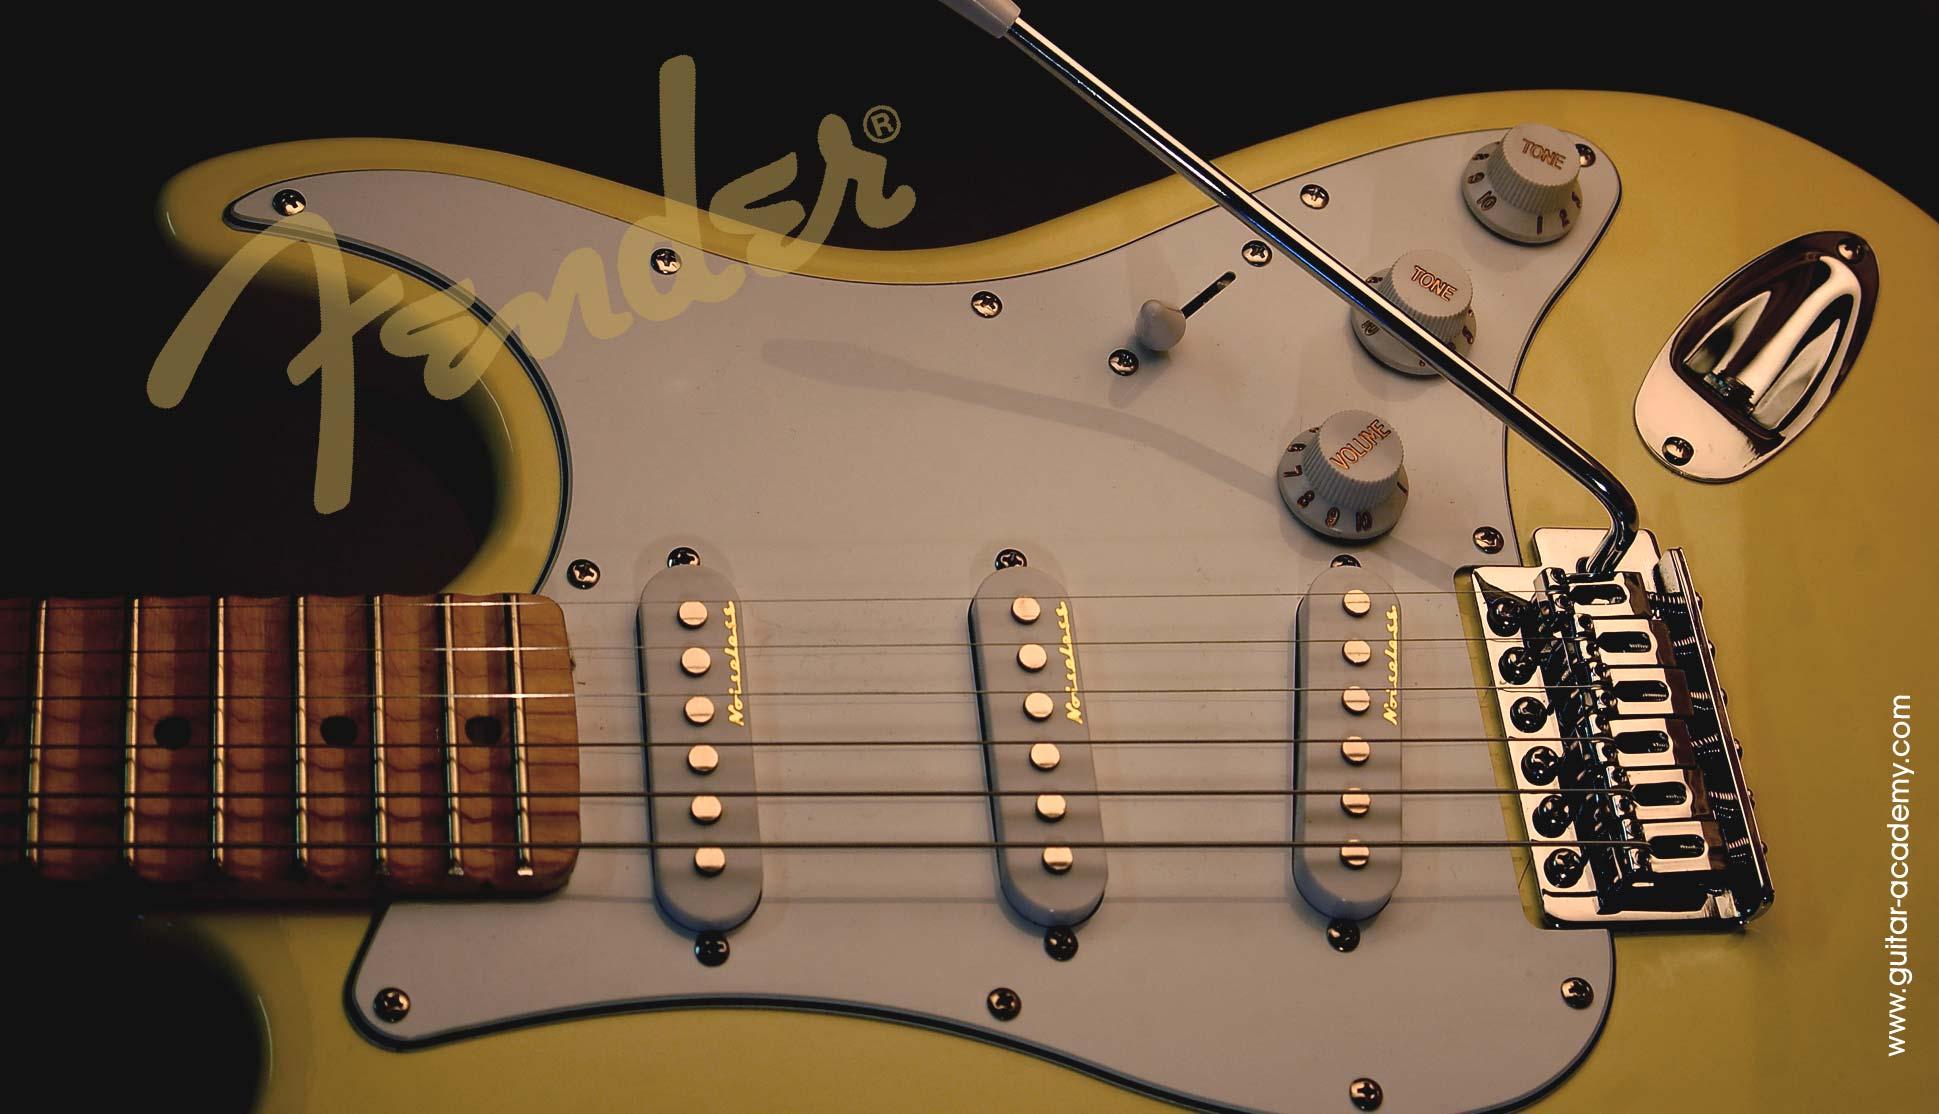 Guitar wallpaper Fender Stratocaster guitar 1939x1114